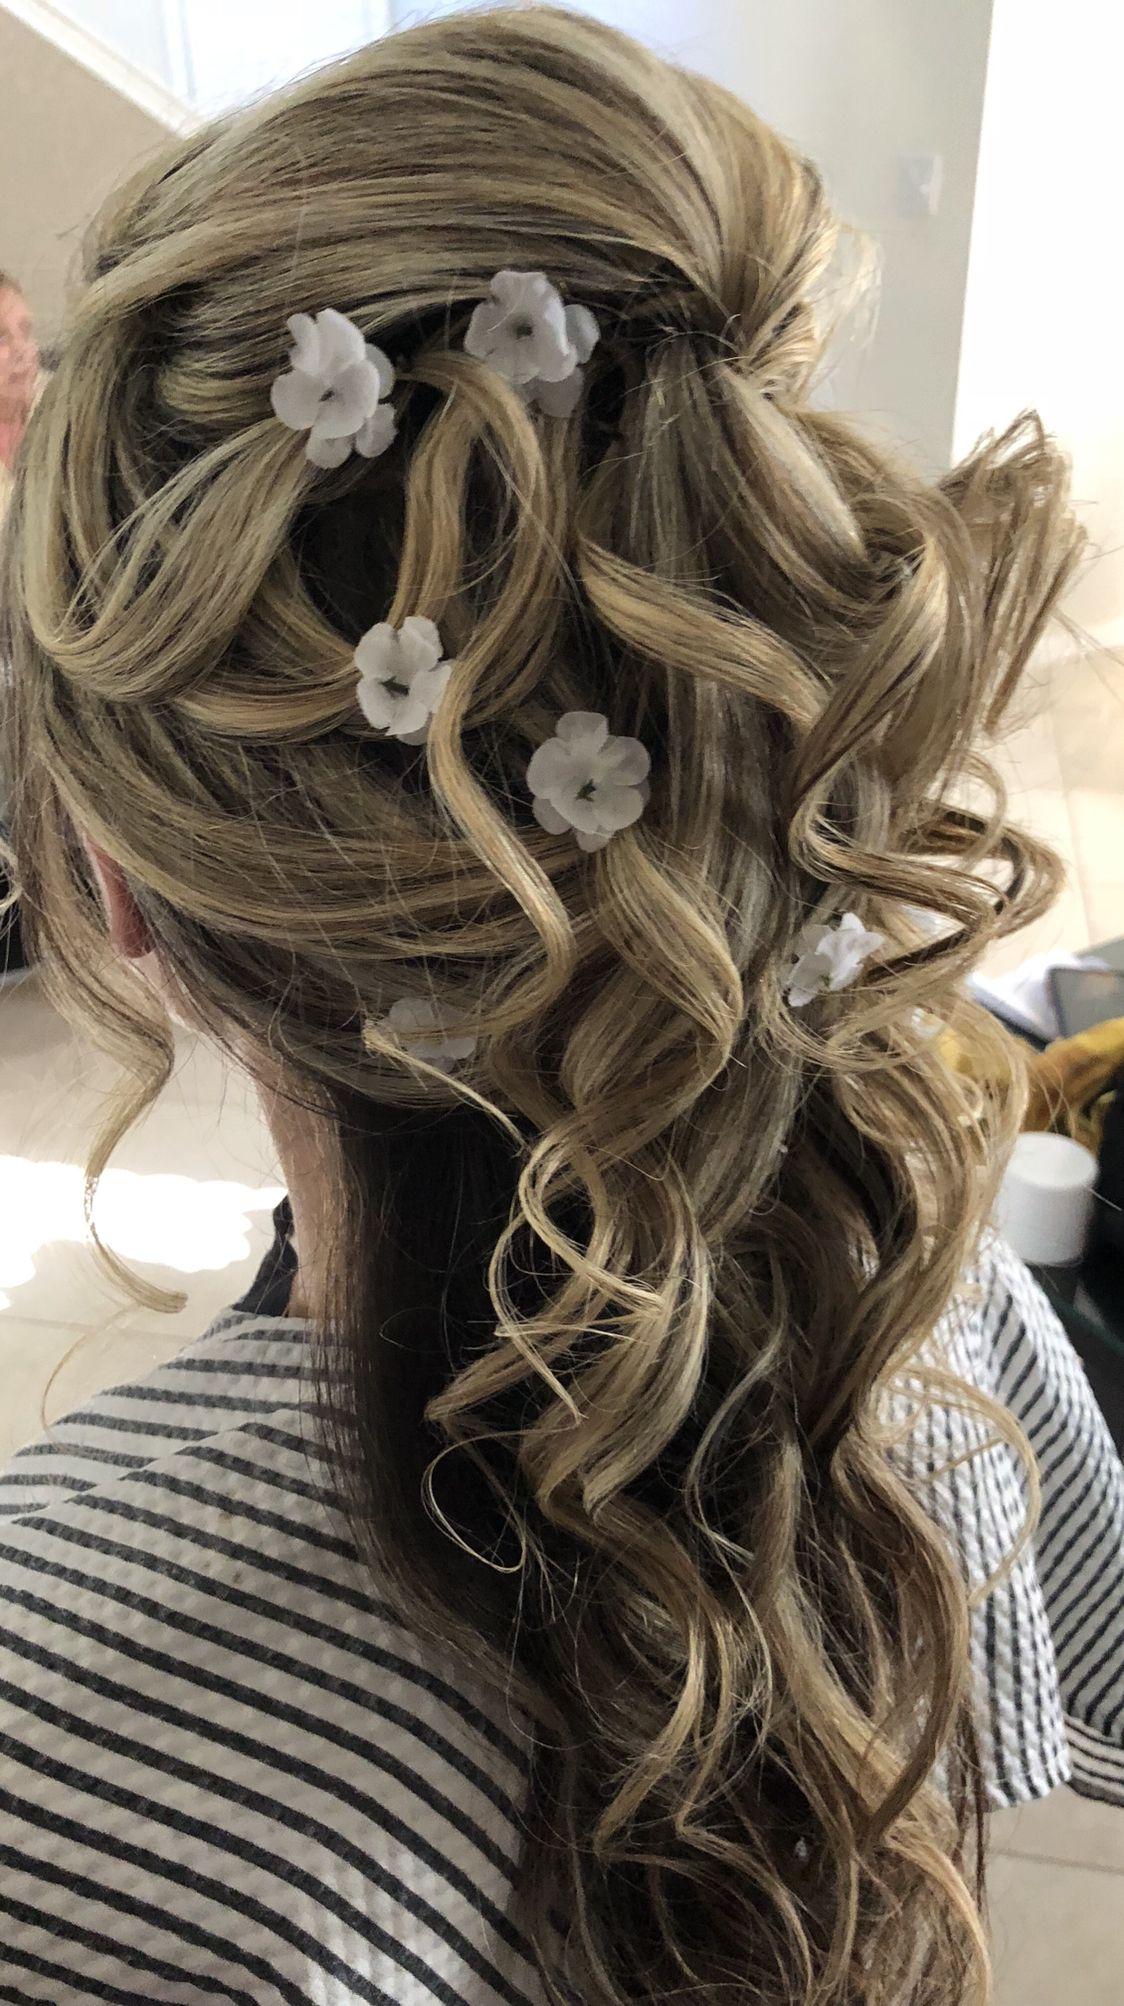 Brides Hair Makeup By Lara Team Bride Davenport Orlando Fl 888 519 1118 Bride Hairstyles Hair Makeup Hair